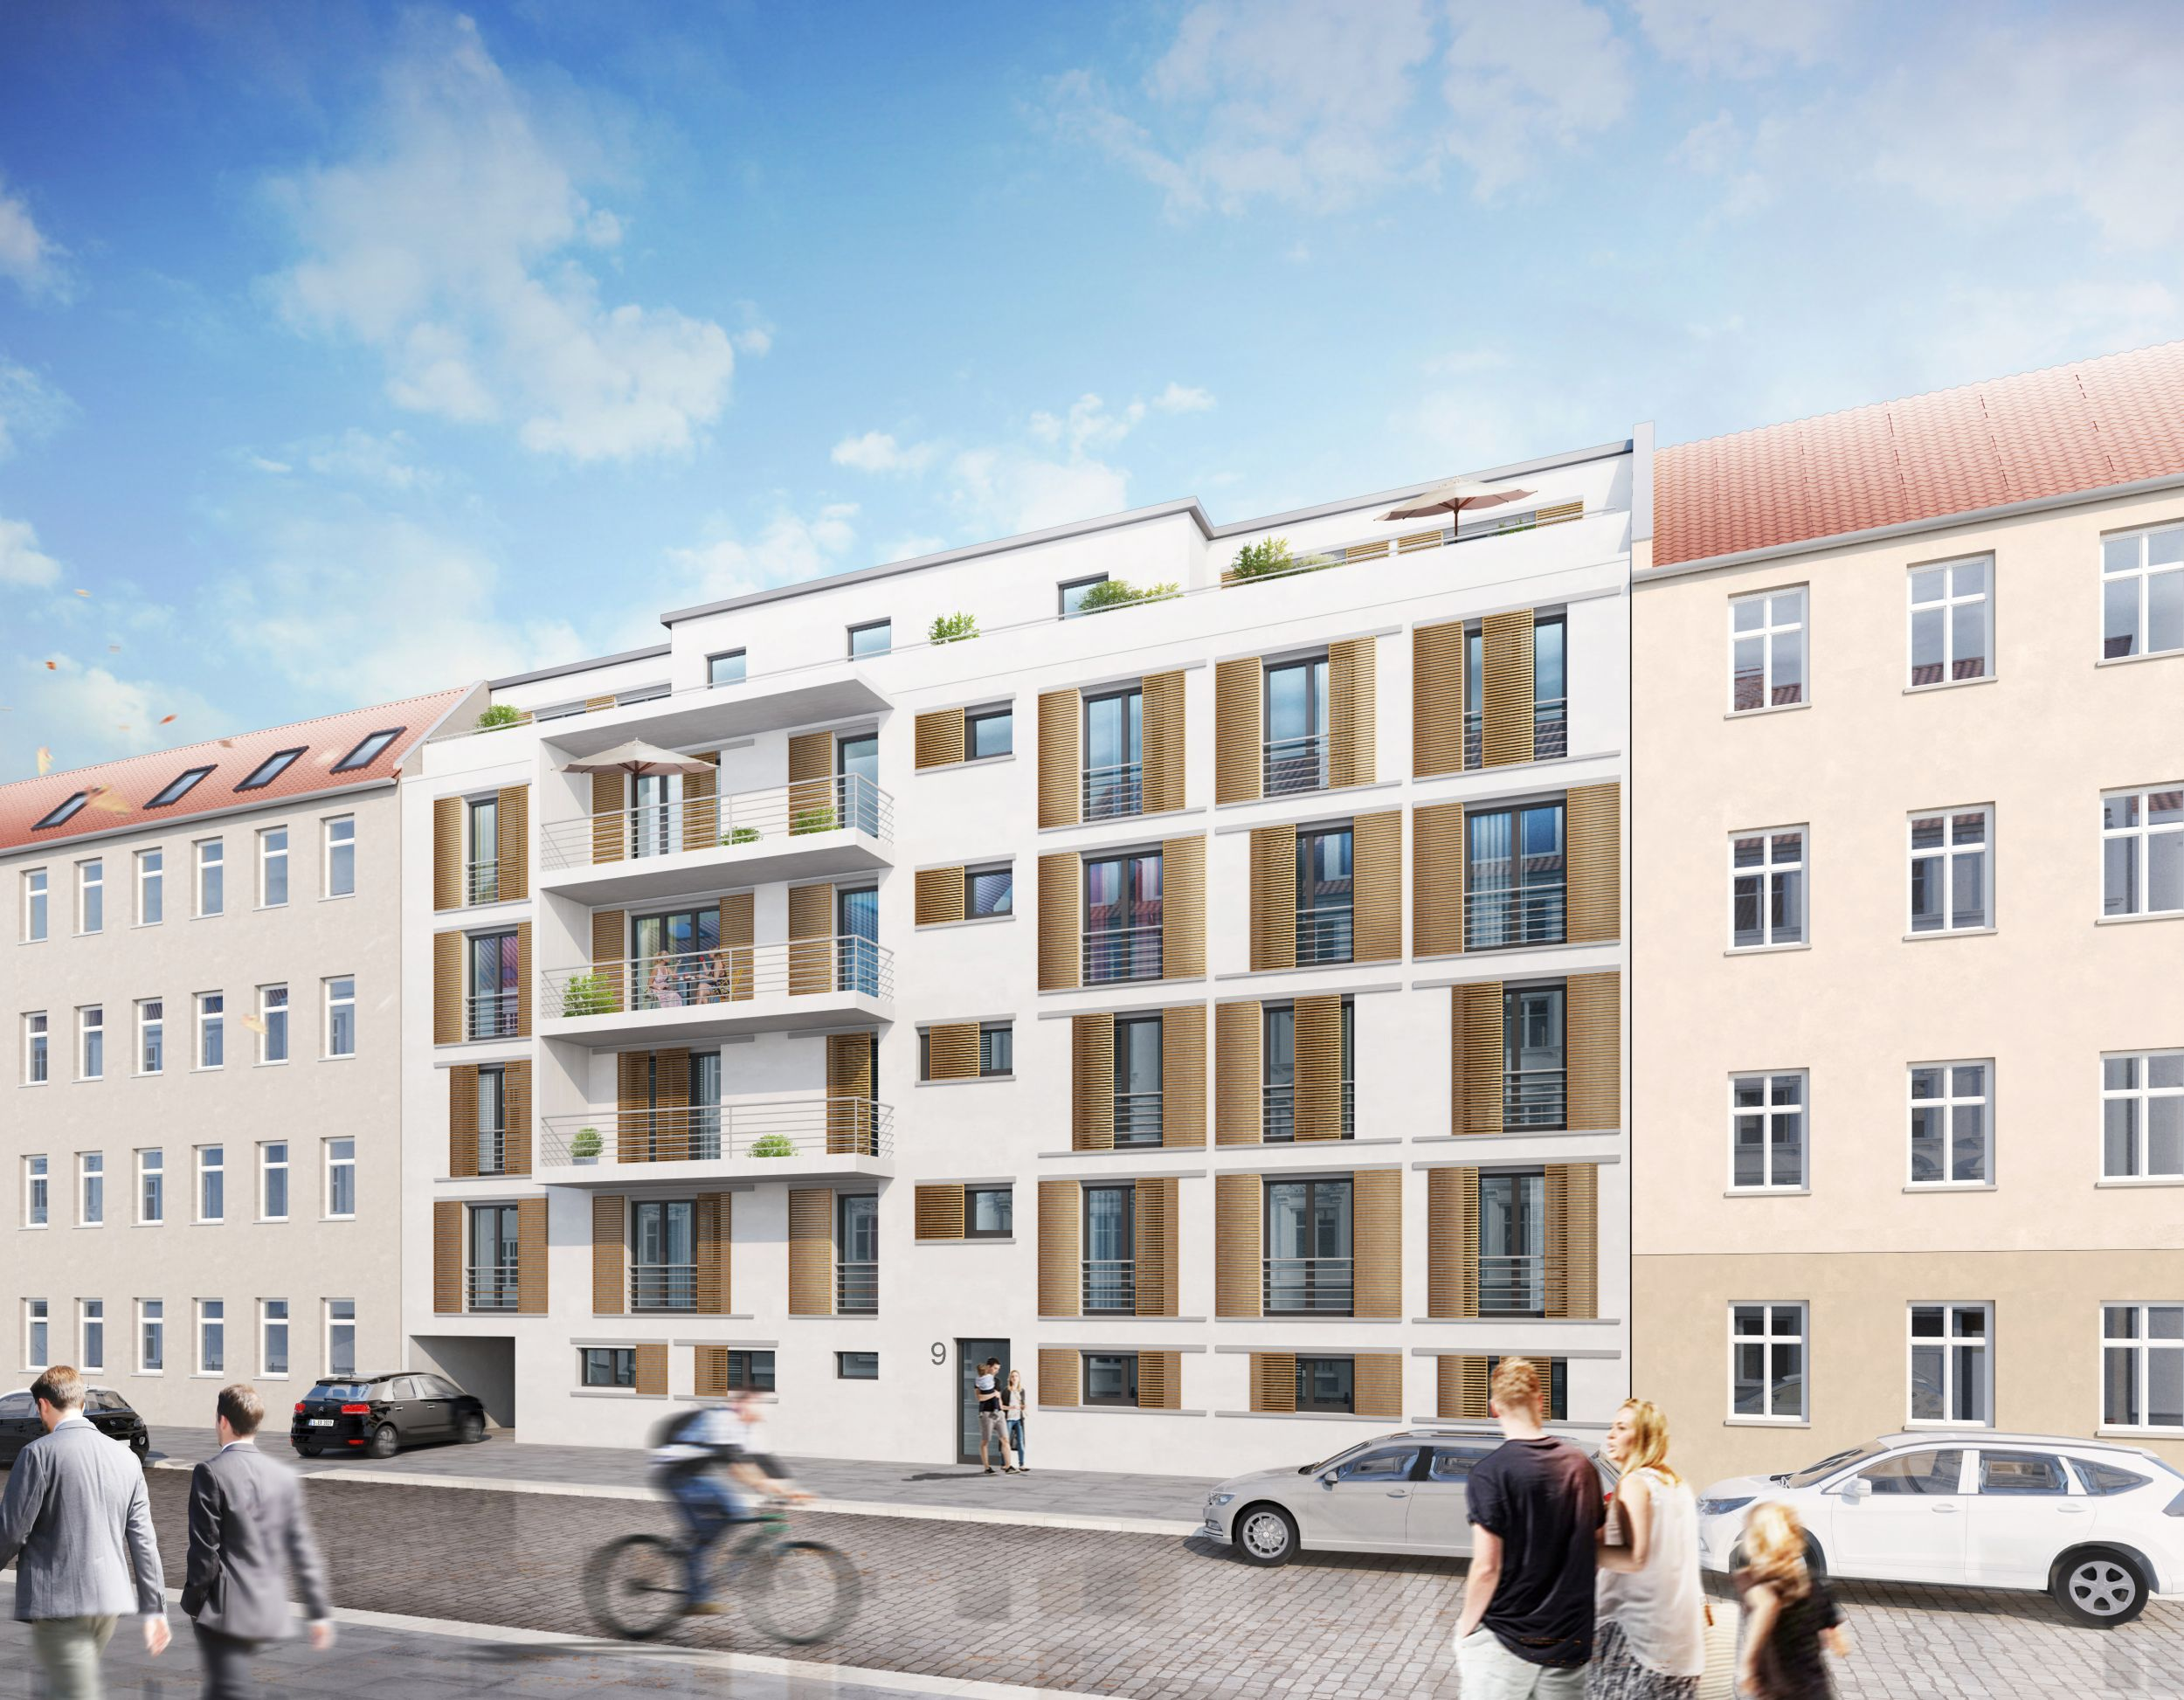 Neubau Köpenick - Pohlestraße nahe der Köpenicker Altstadt - Berlin